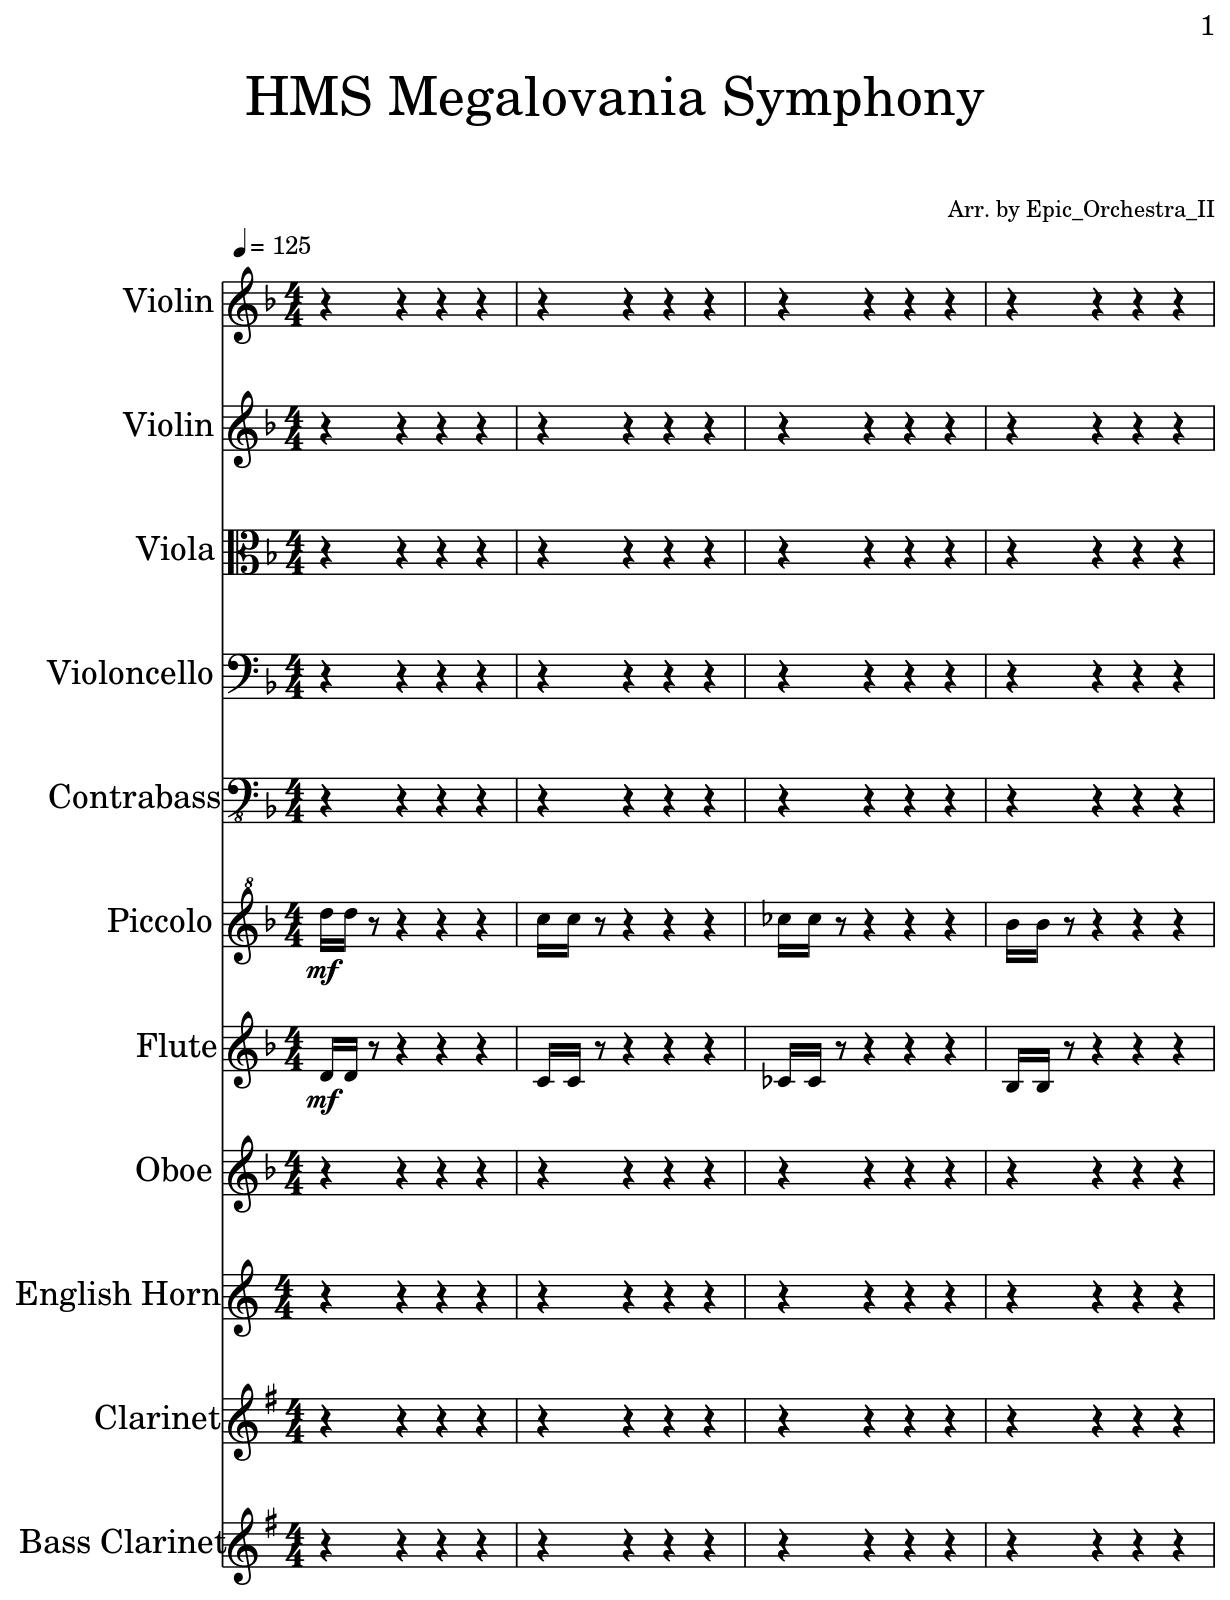 Megalovania Sheet Music Violin Dragonsfootball17